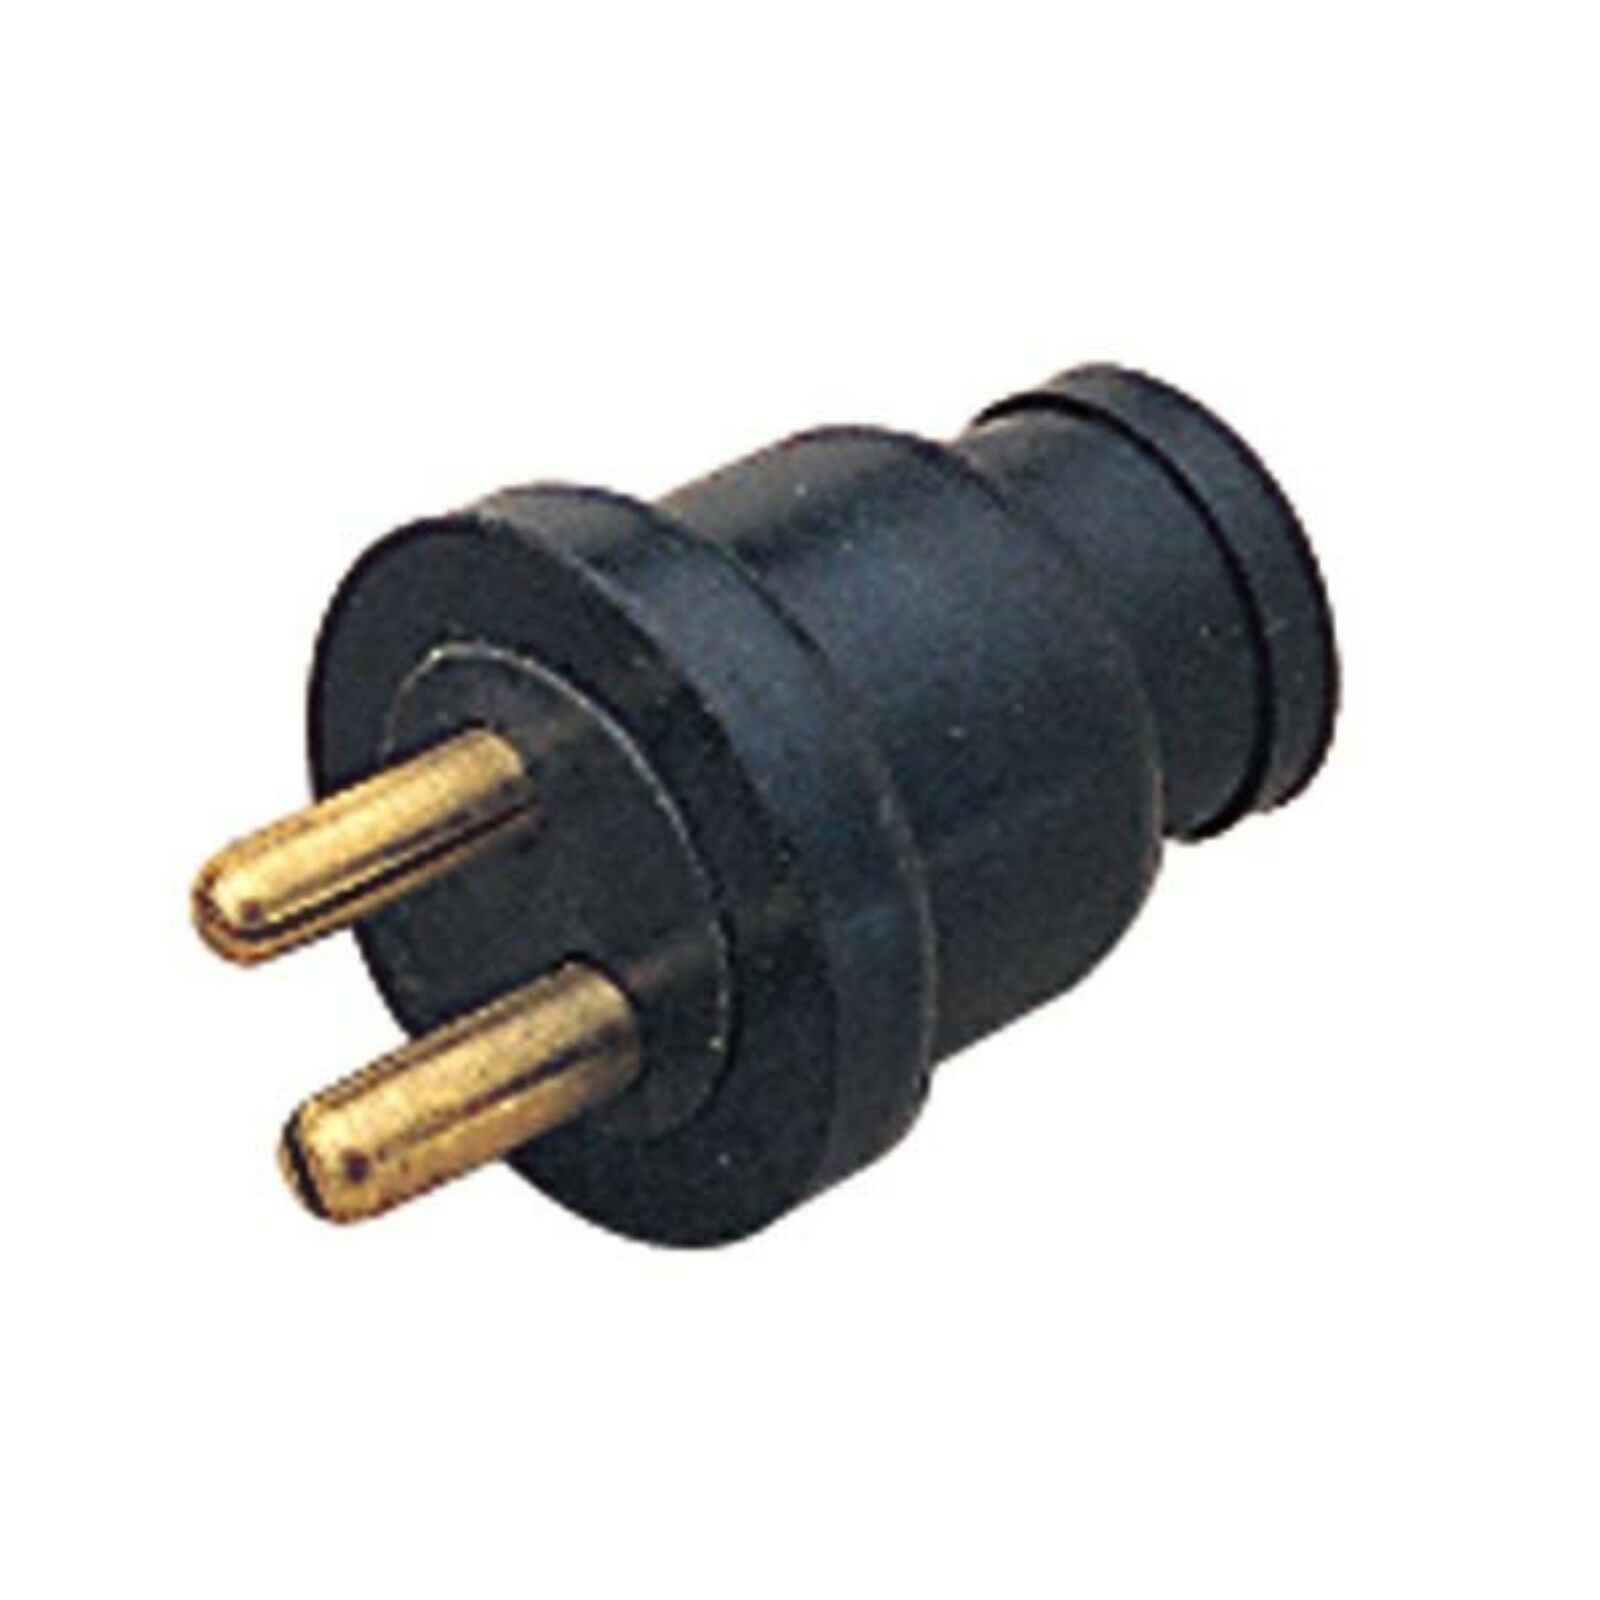 Sea Dog 426144-1 Polarized Plug For Cable Outlet 12V | eBay